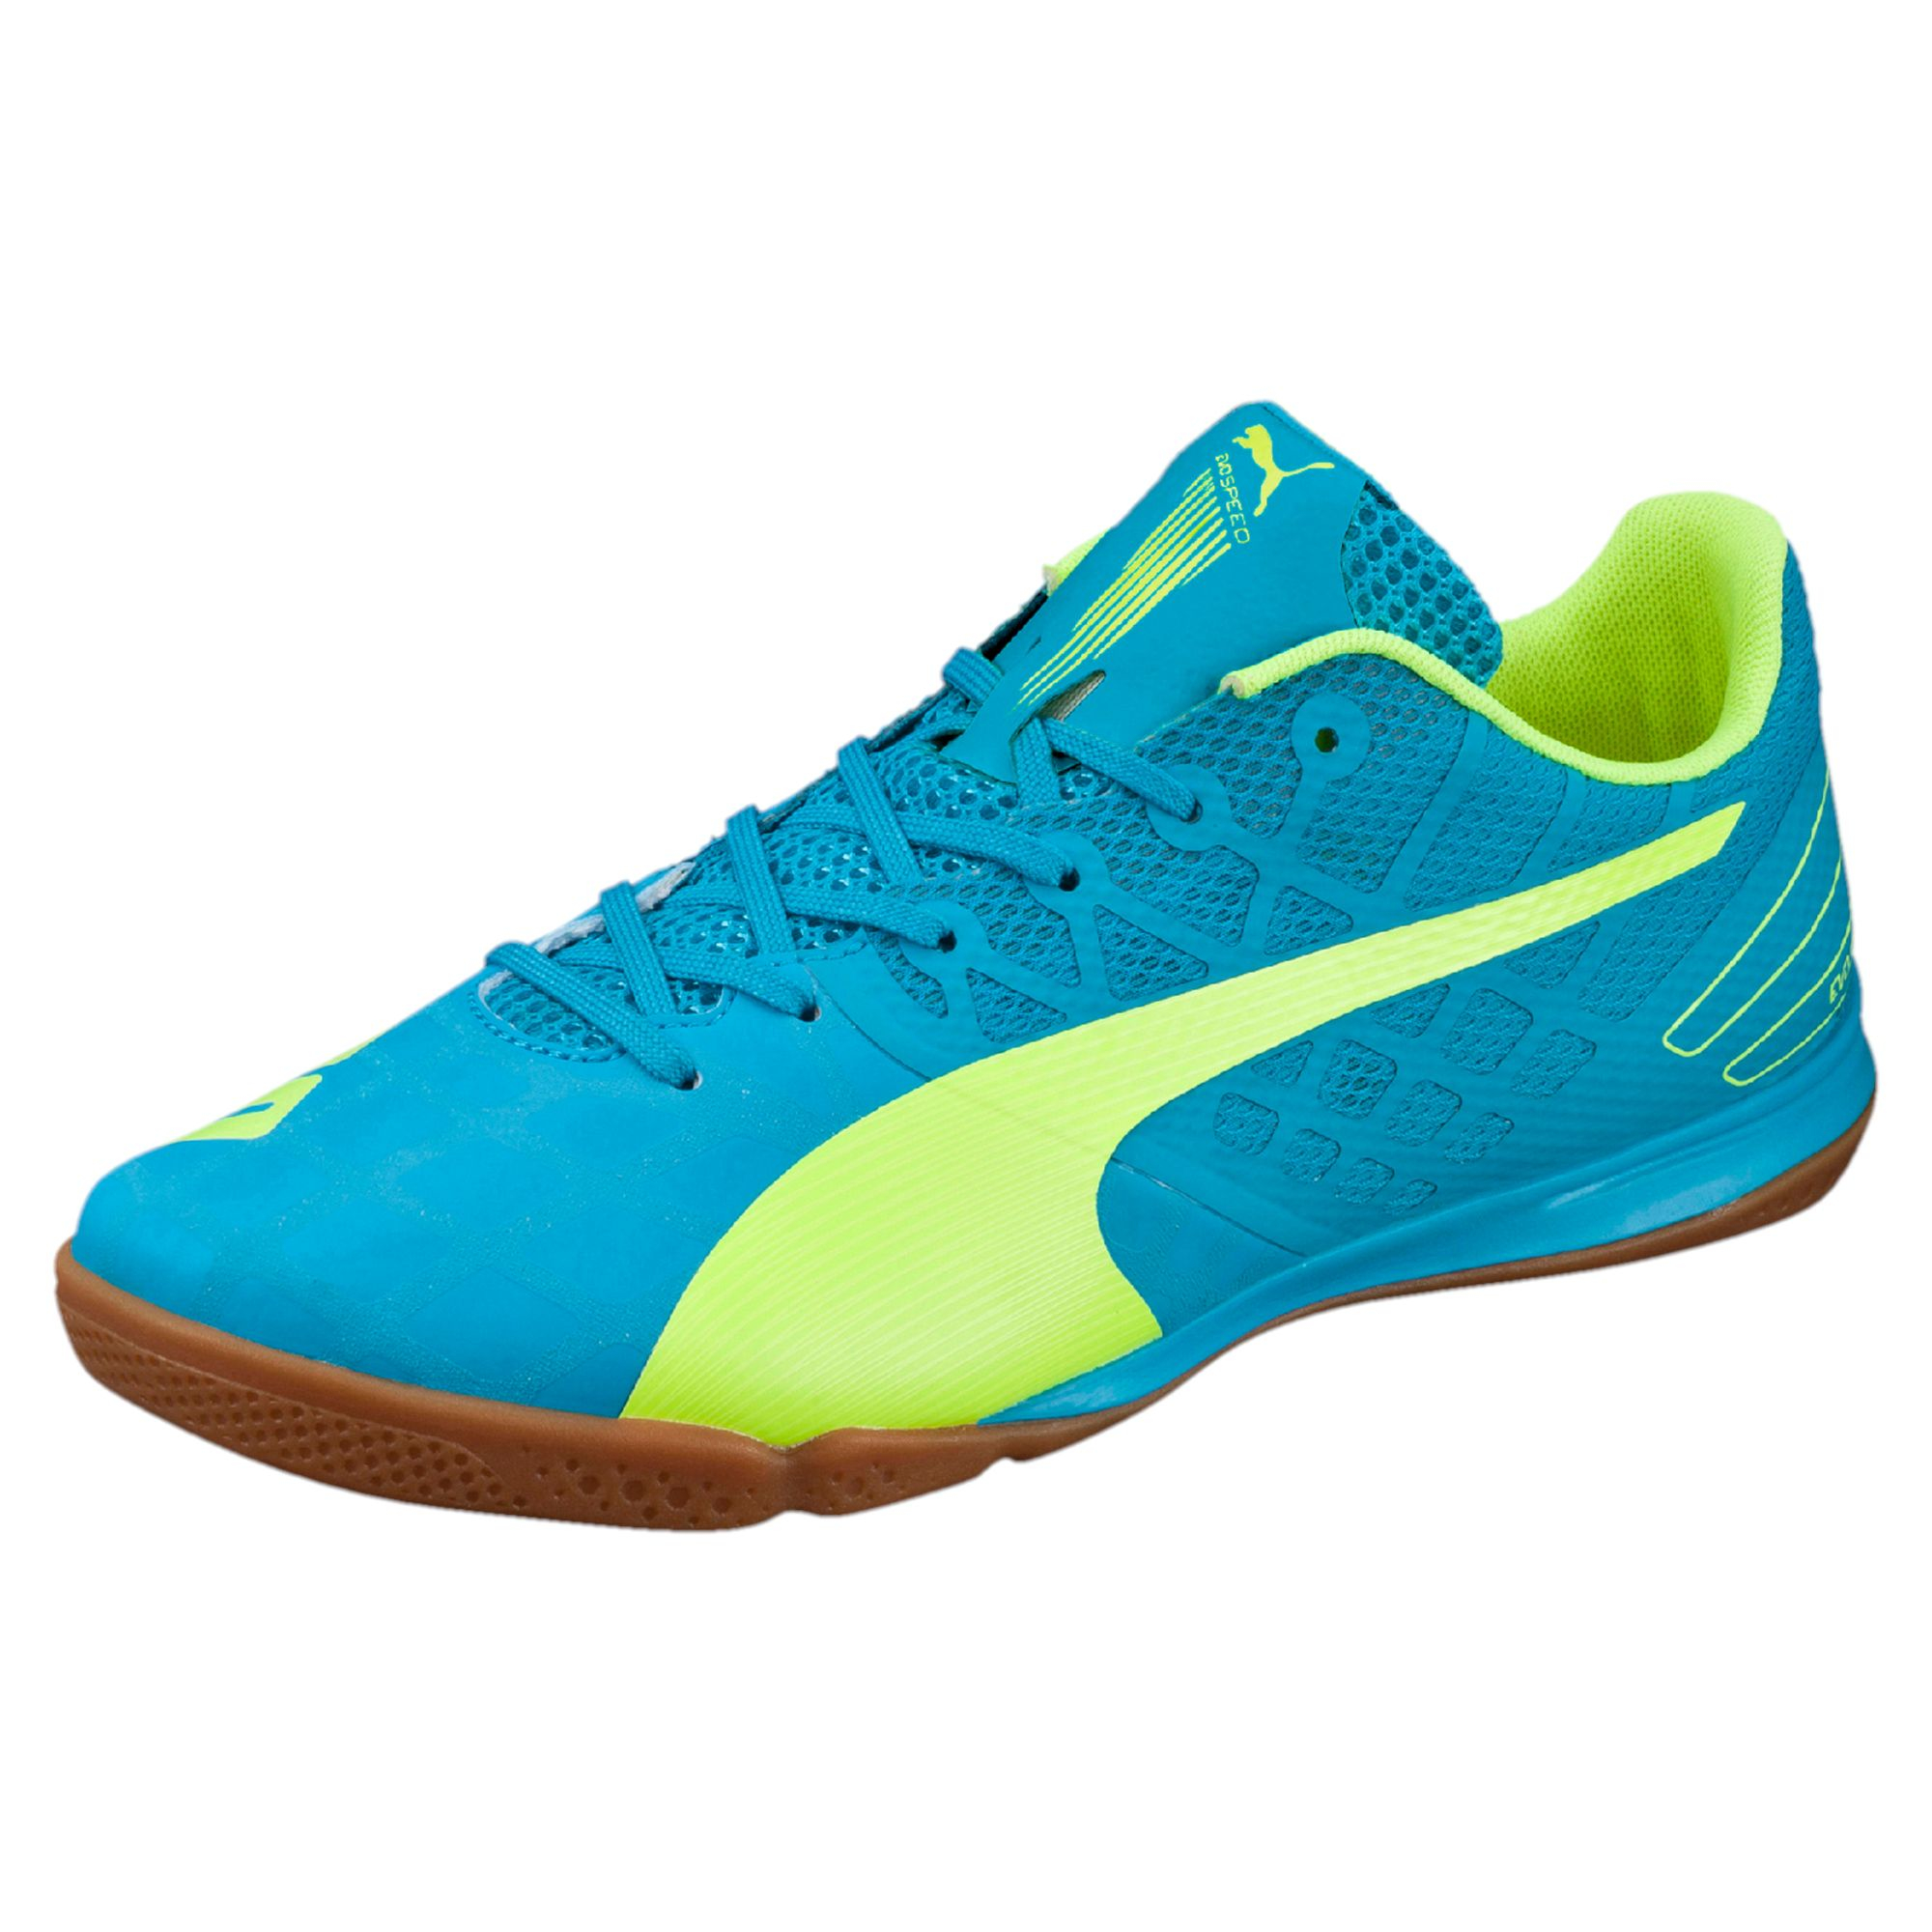 db987e76774 Lyst - PUMA Evospeed Sala 3.4 Men s Indoor Soccer Shoes in Blue for Men